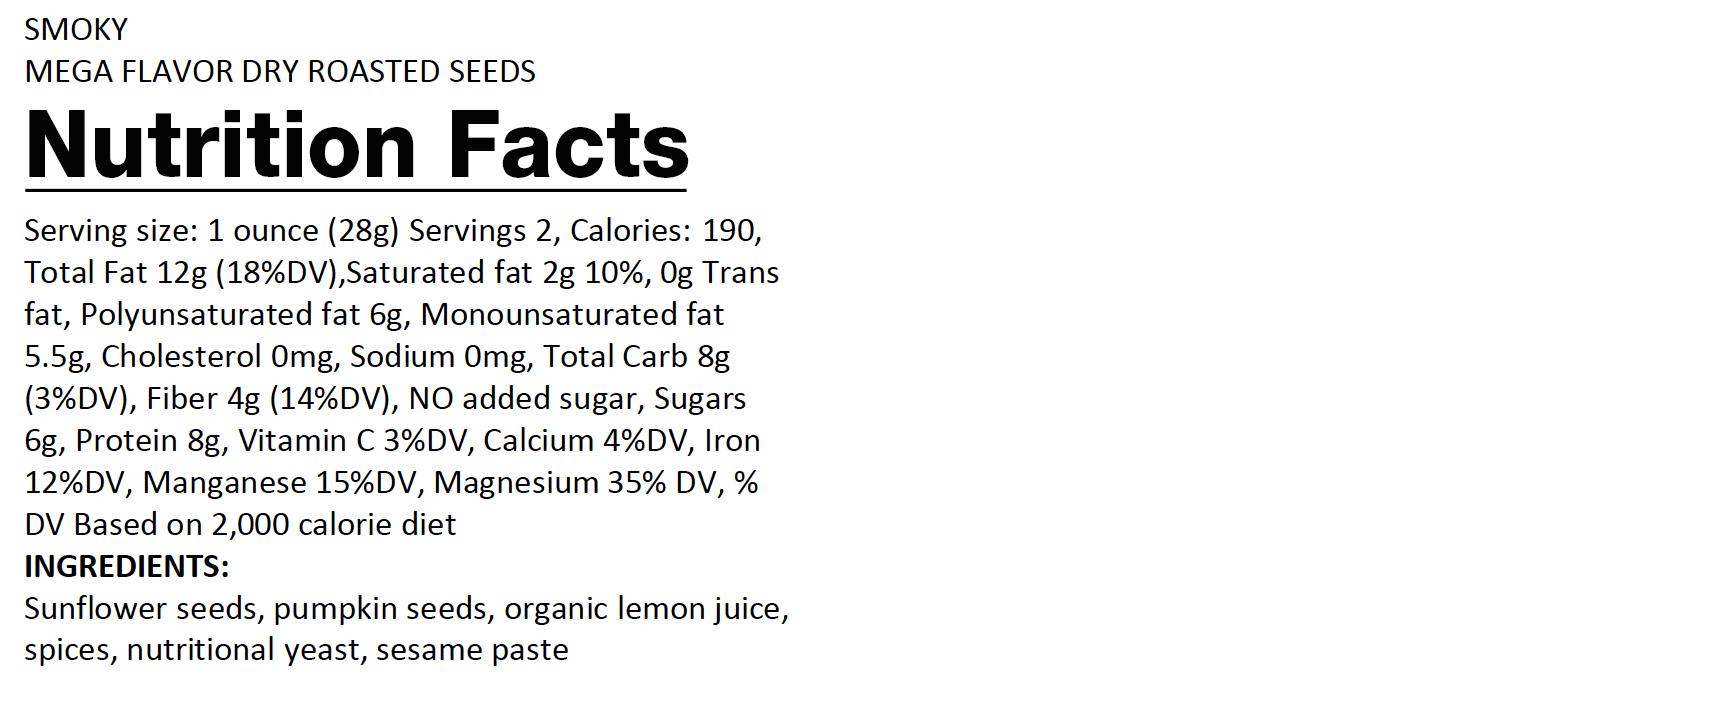 smoky-seeds-nut-facts.jpg